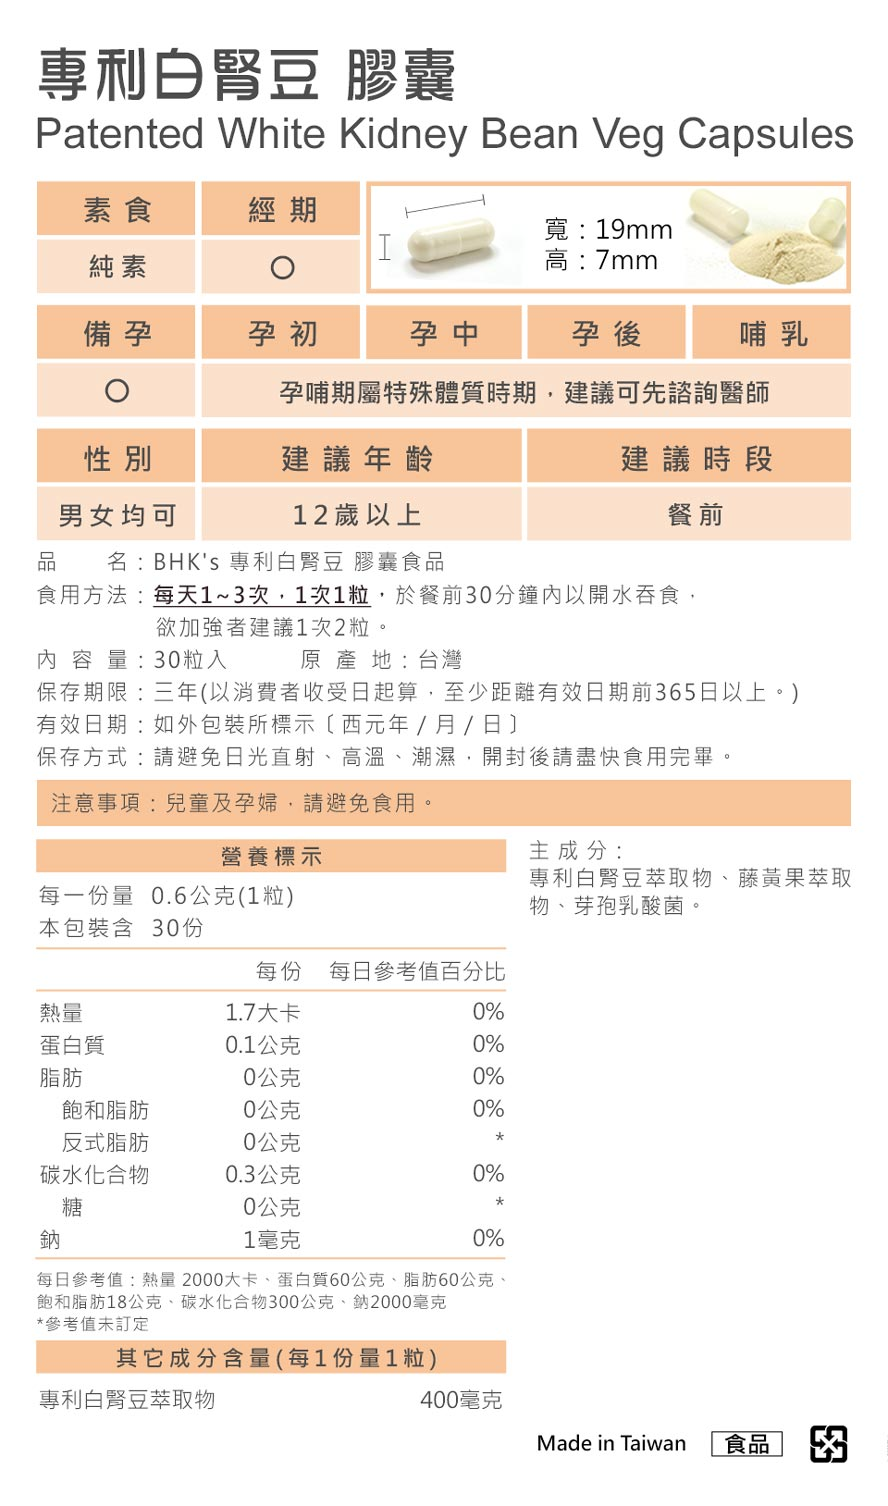 BHK's白腎豆通過各種檢驗,安全無疑慮,無副作用。